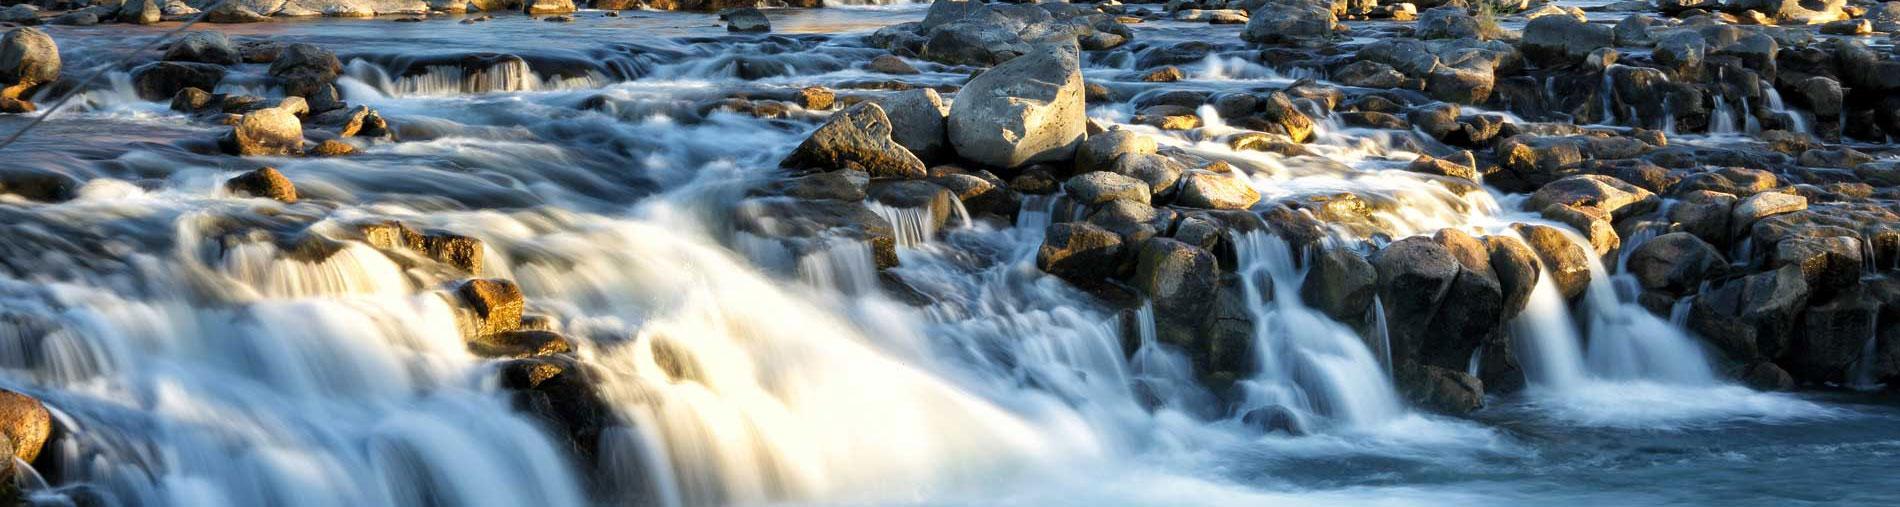 waterfall near idaho falls